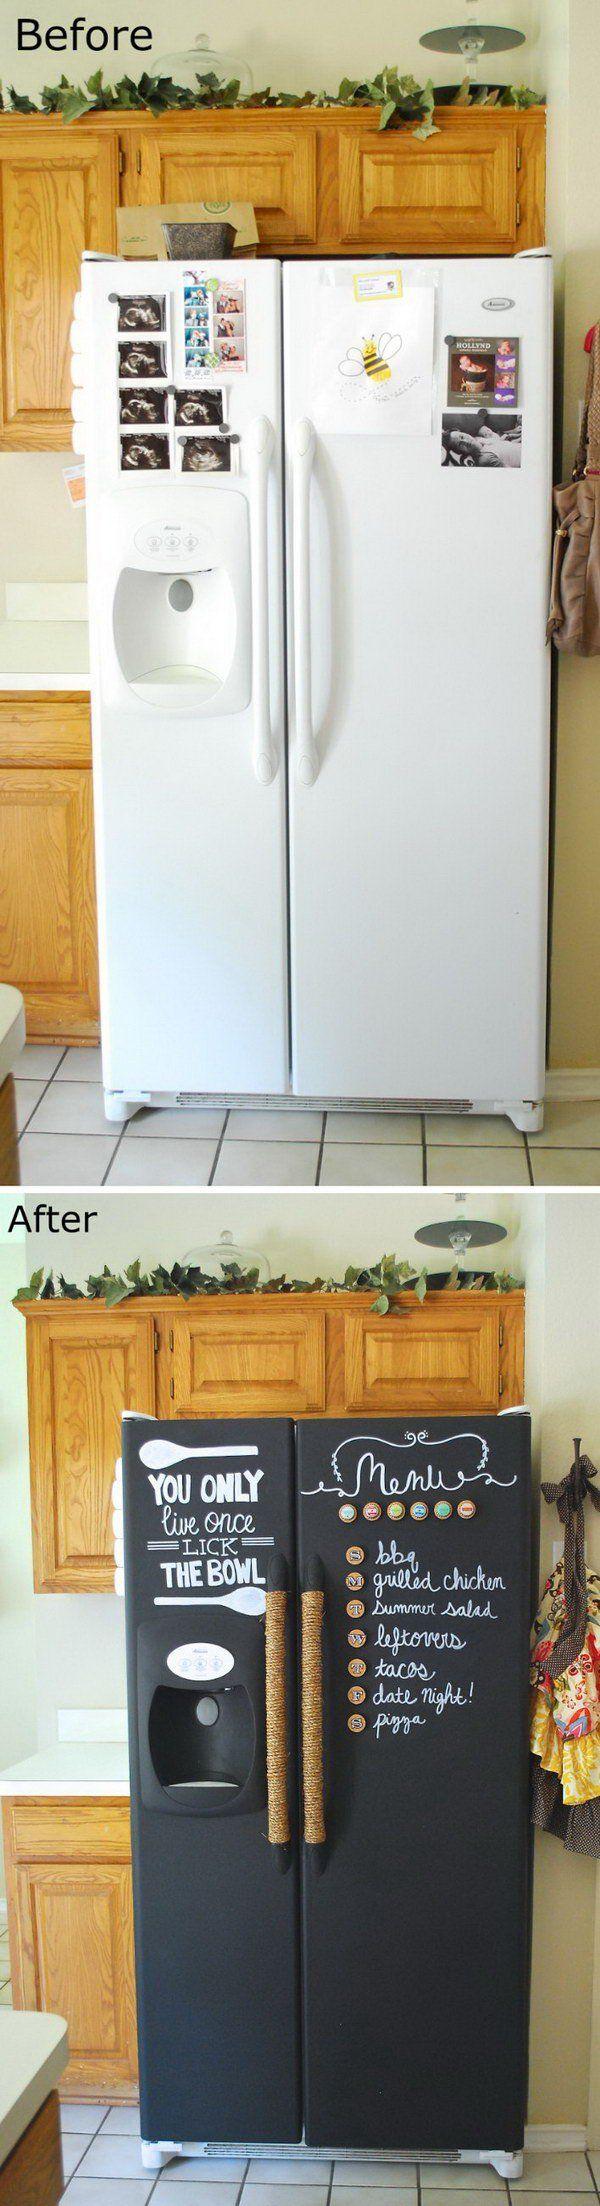 DIY Chalkboard Paint Refrigerator. | Kitchen | Pinterest | Diy möbel ...